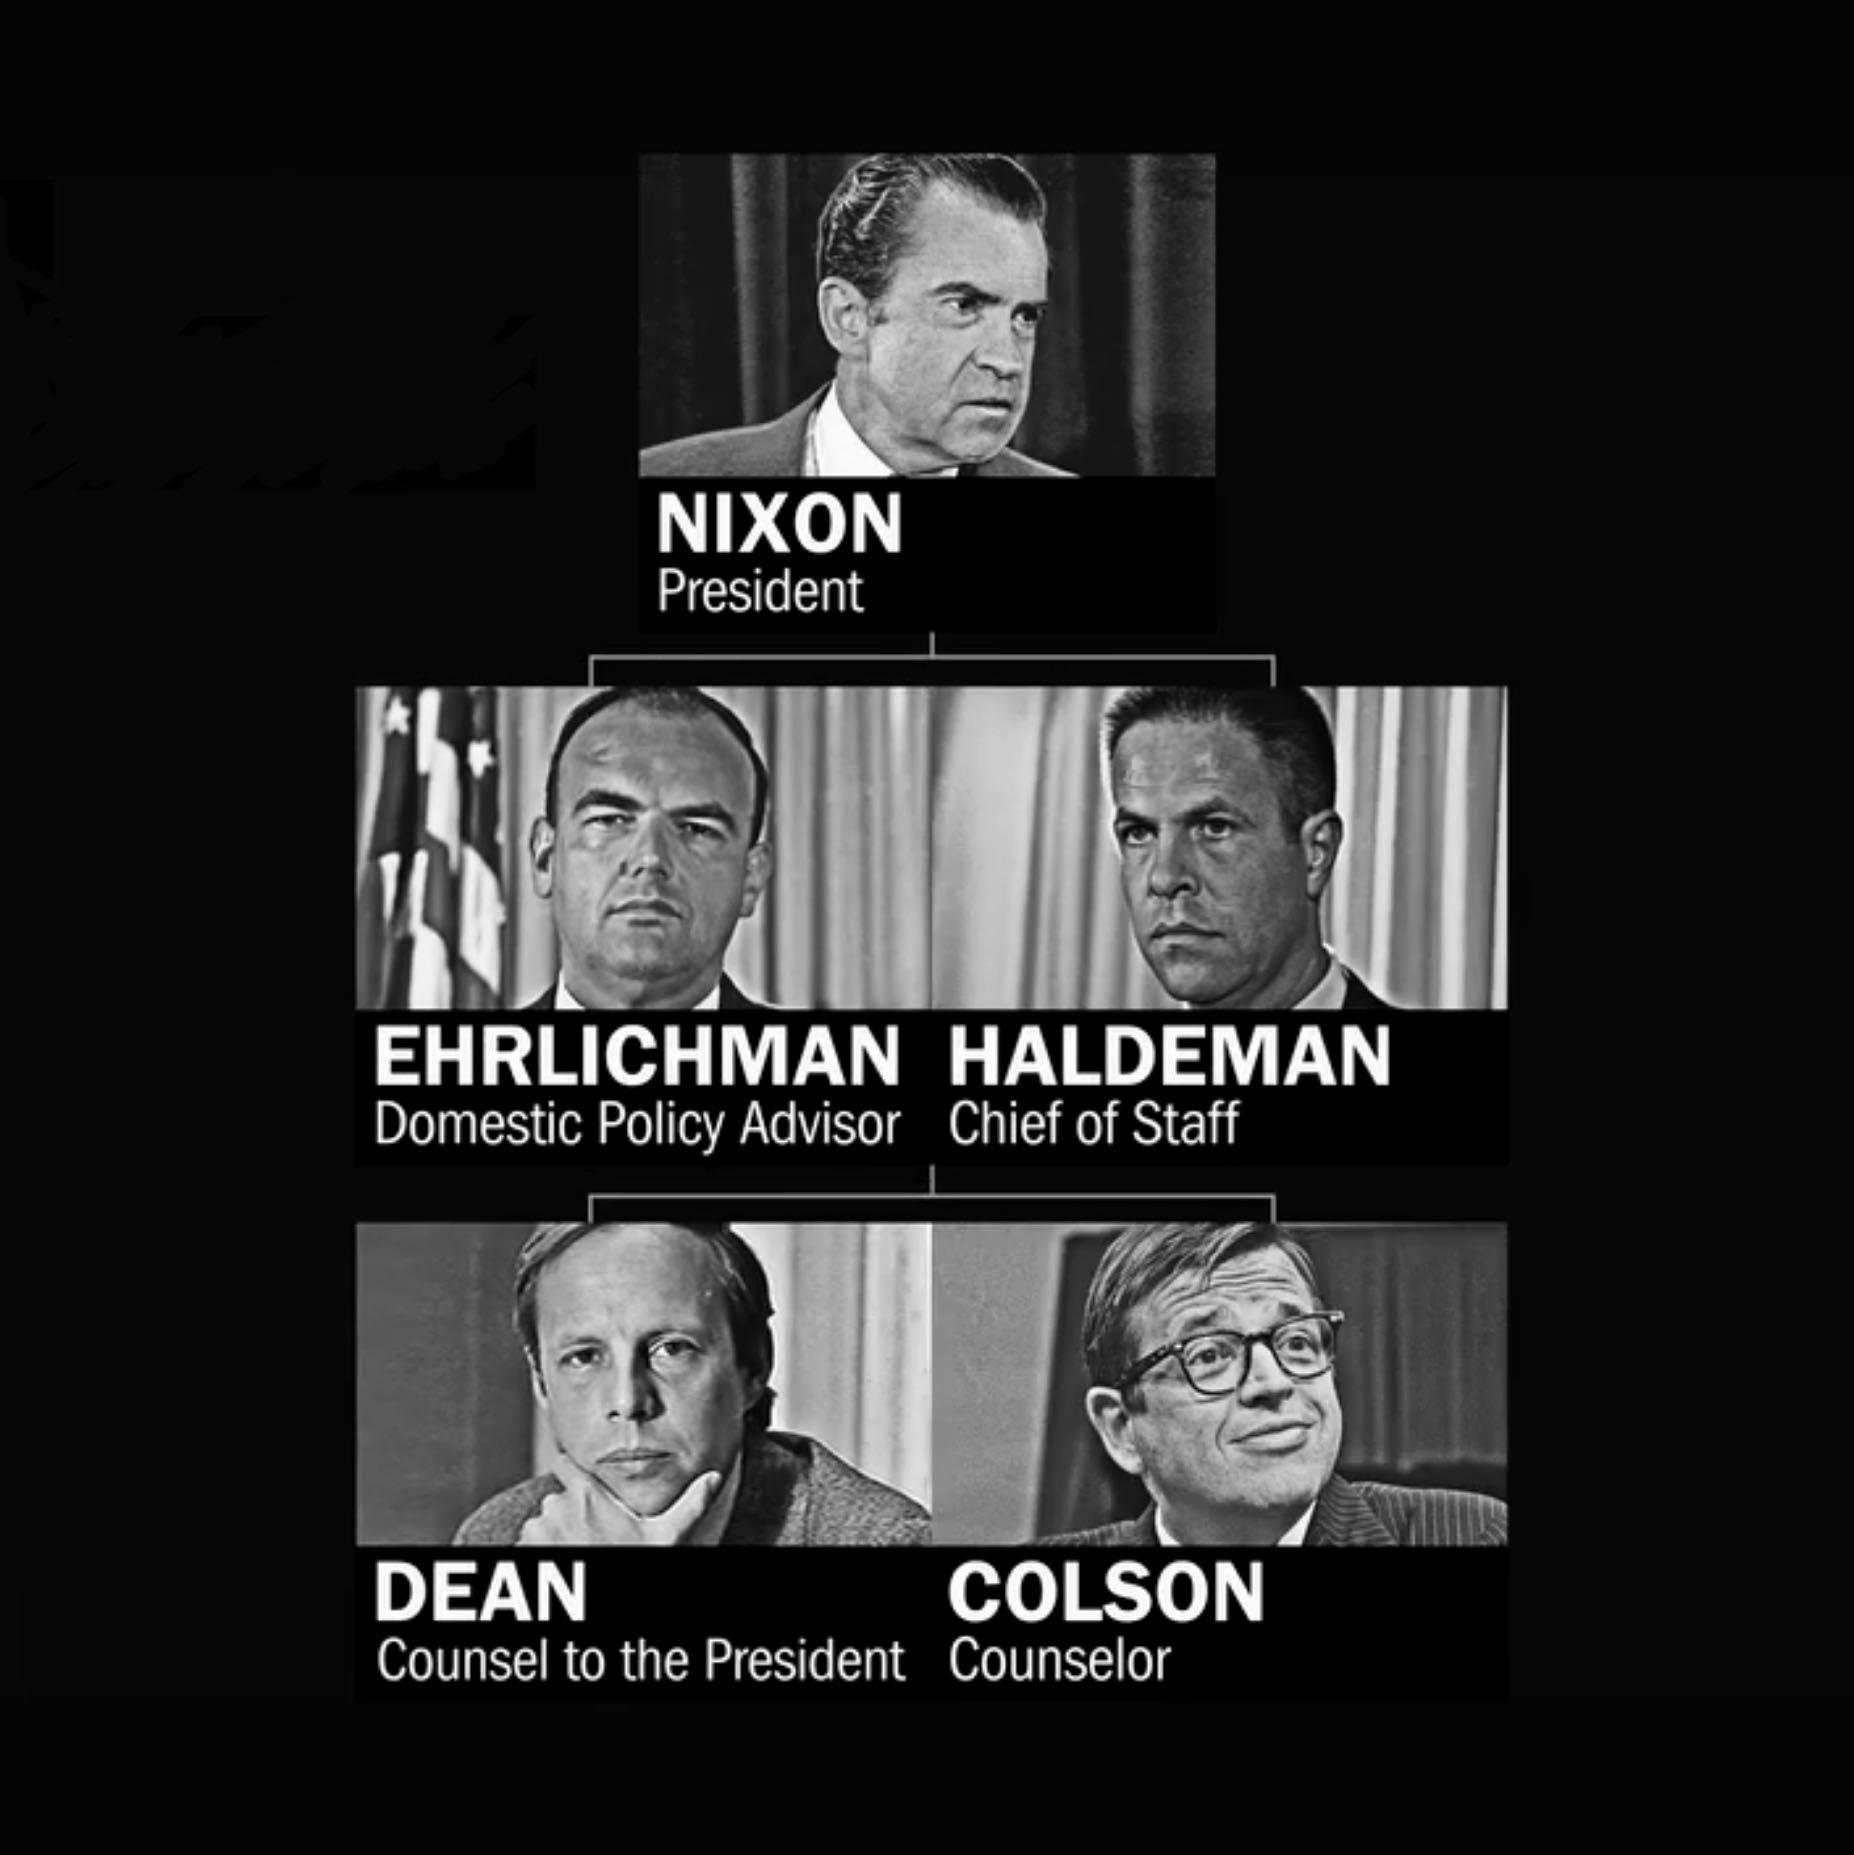 Image of President Nixon's cabinet